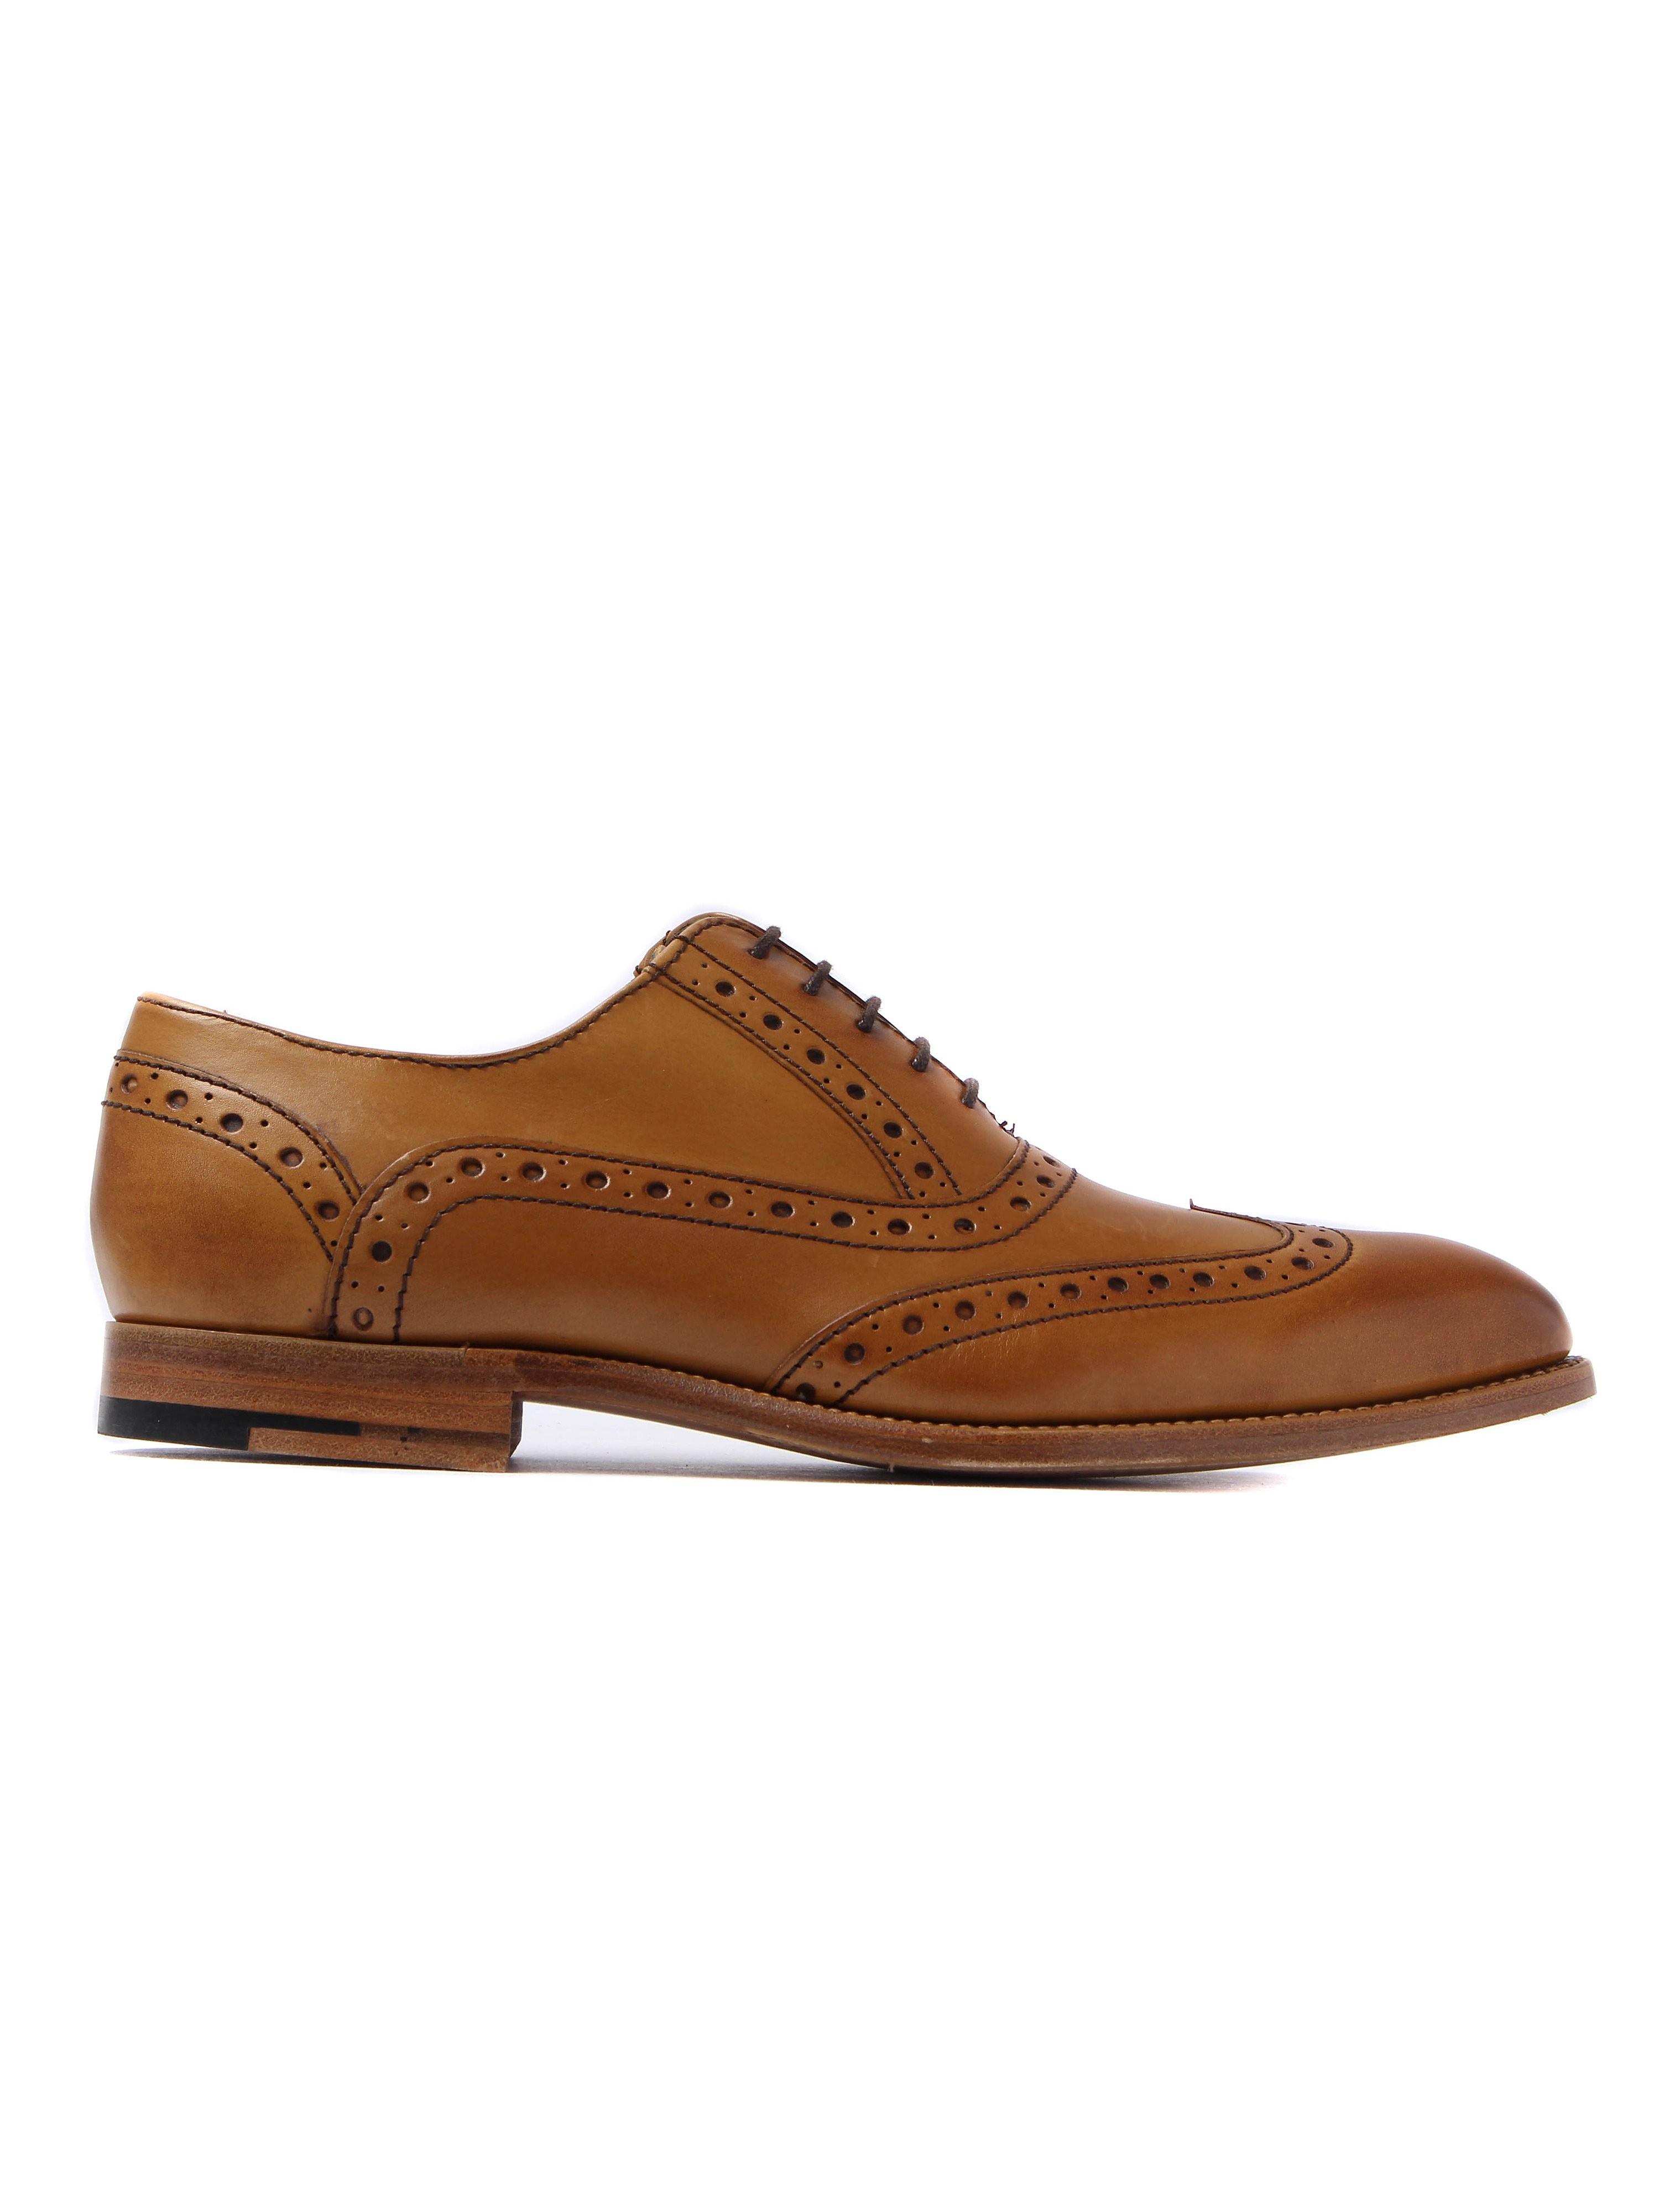 Barker Men's Grant Leather Oxford Brogues - Cedar